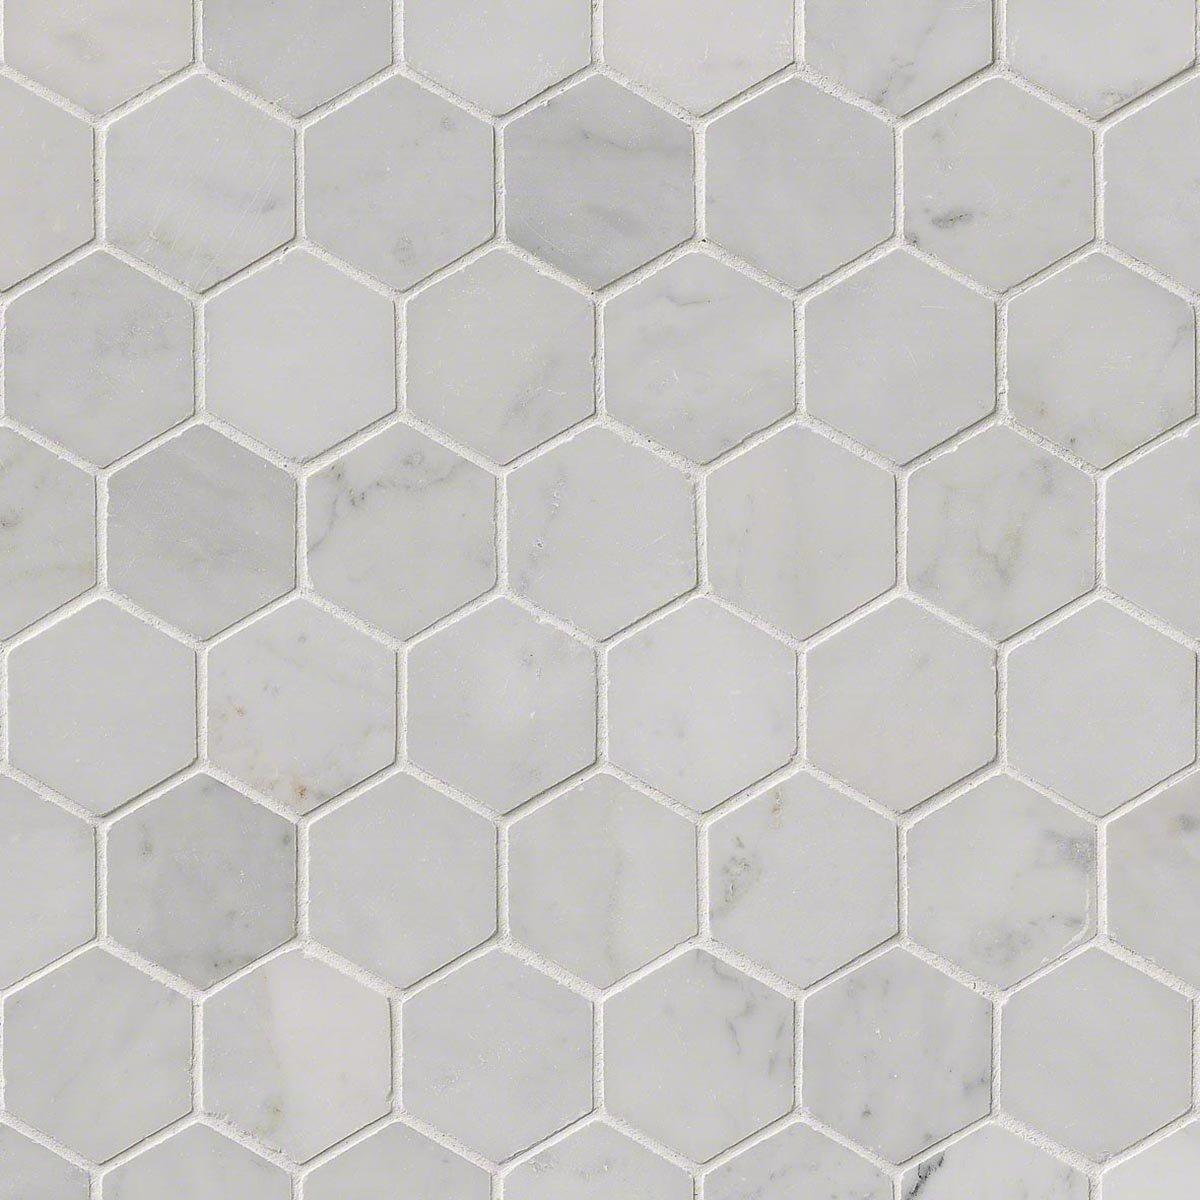 MS International SMOT-CAR-2HEXP Carrara White Hexagon Polished Mosaic Tiles, 2'' by MS International